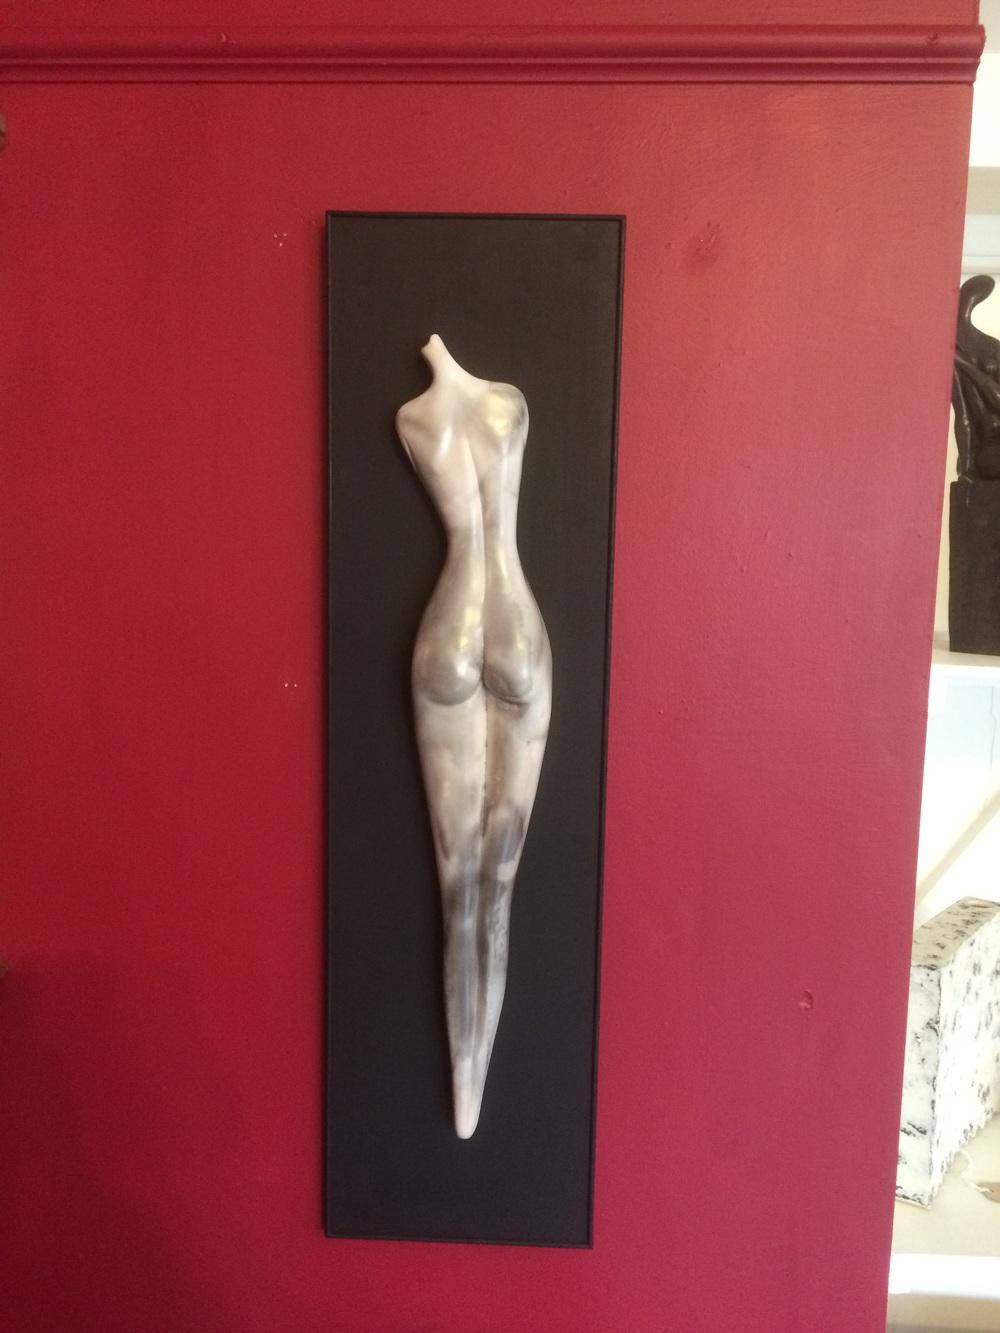 Ferri Farahmandi - smoke fired figurative ceramics